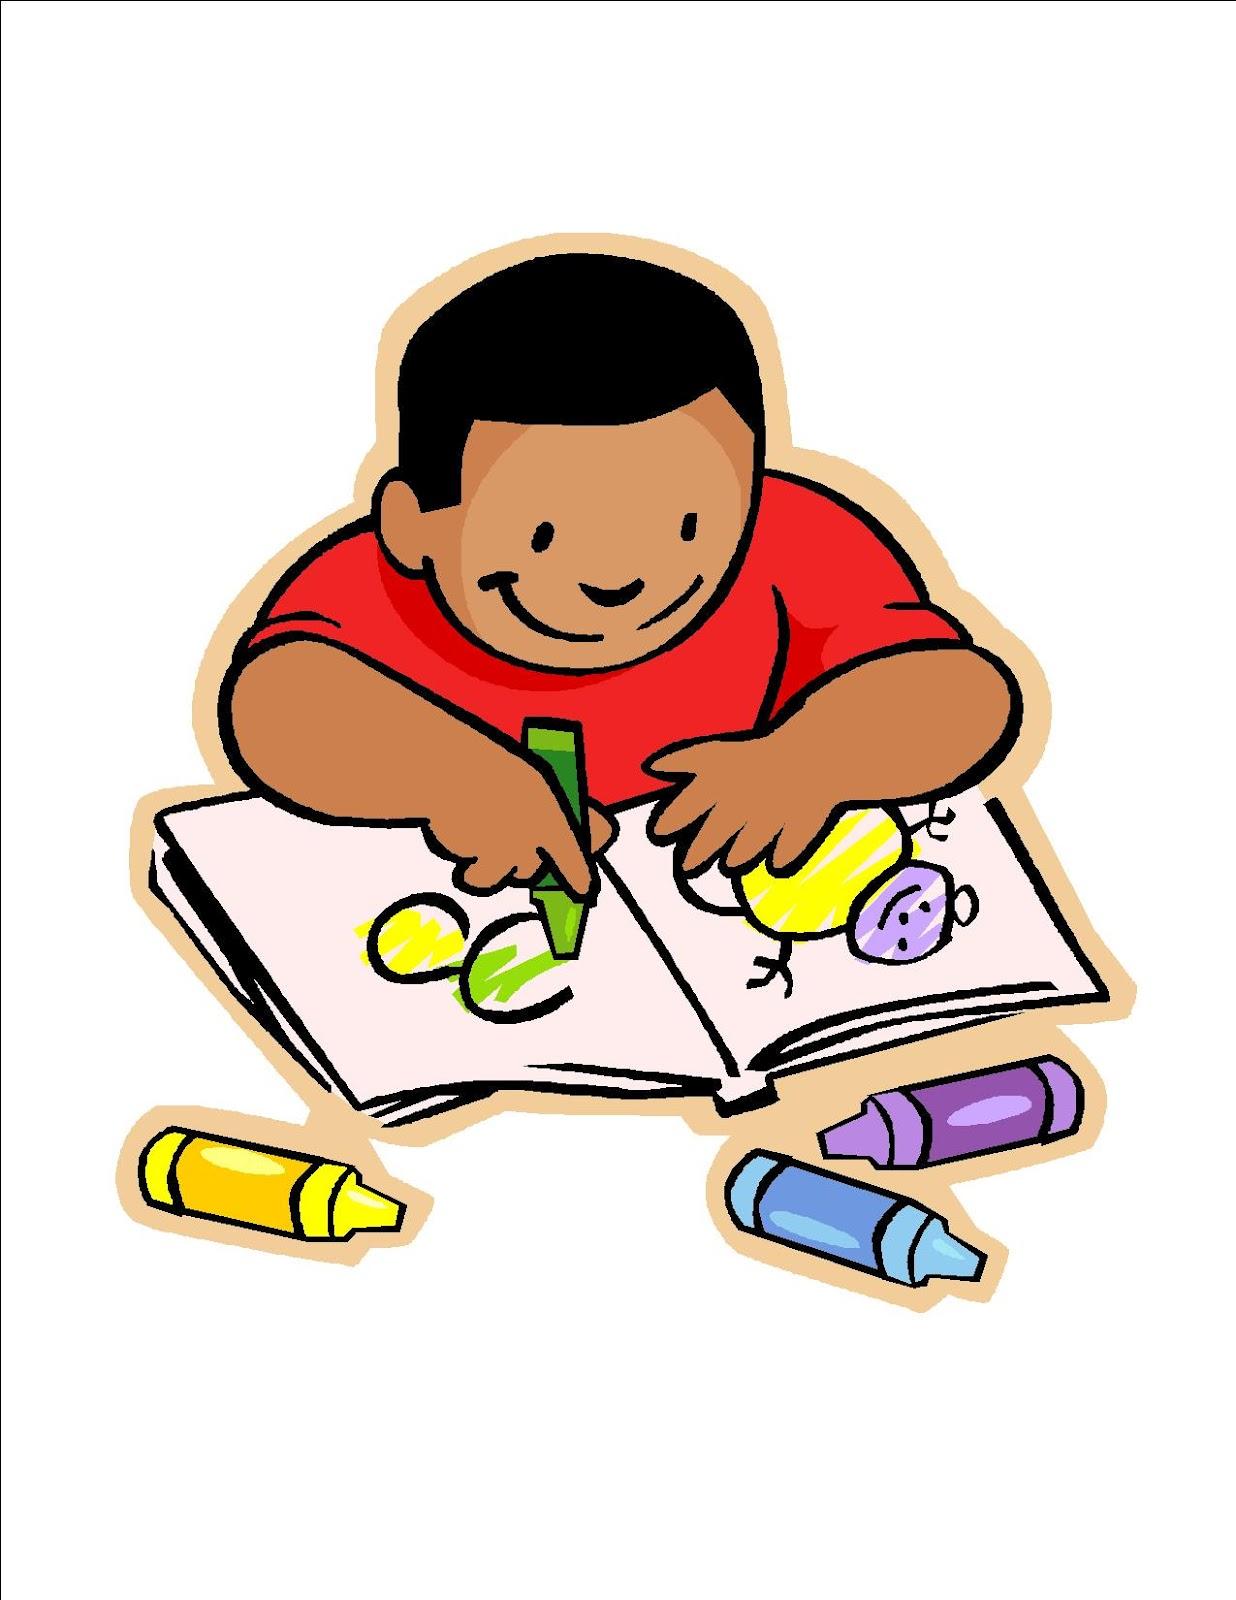 Activities clipart drawing, Activities drawing Transparent.